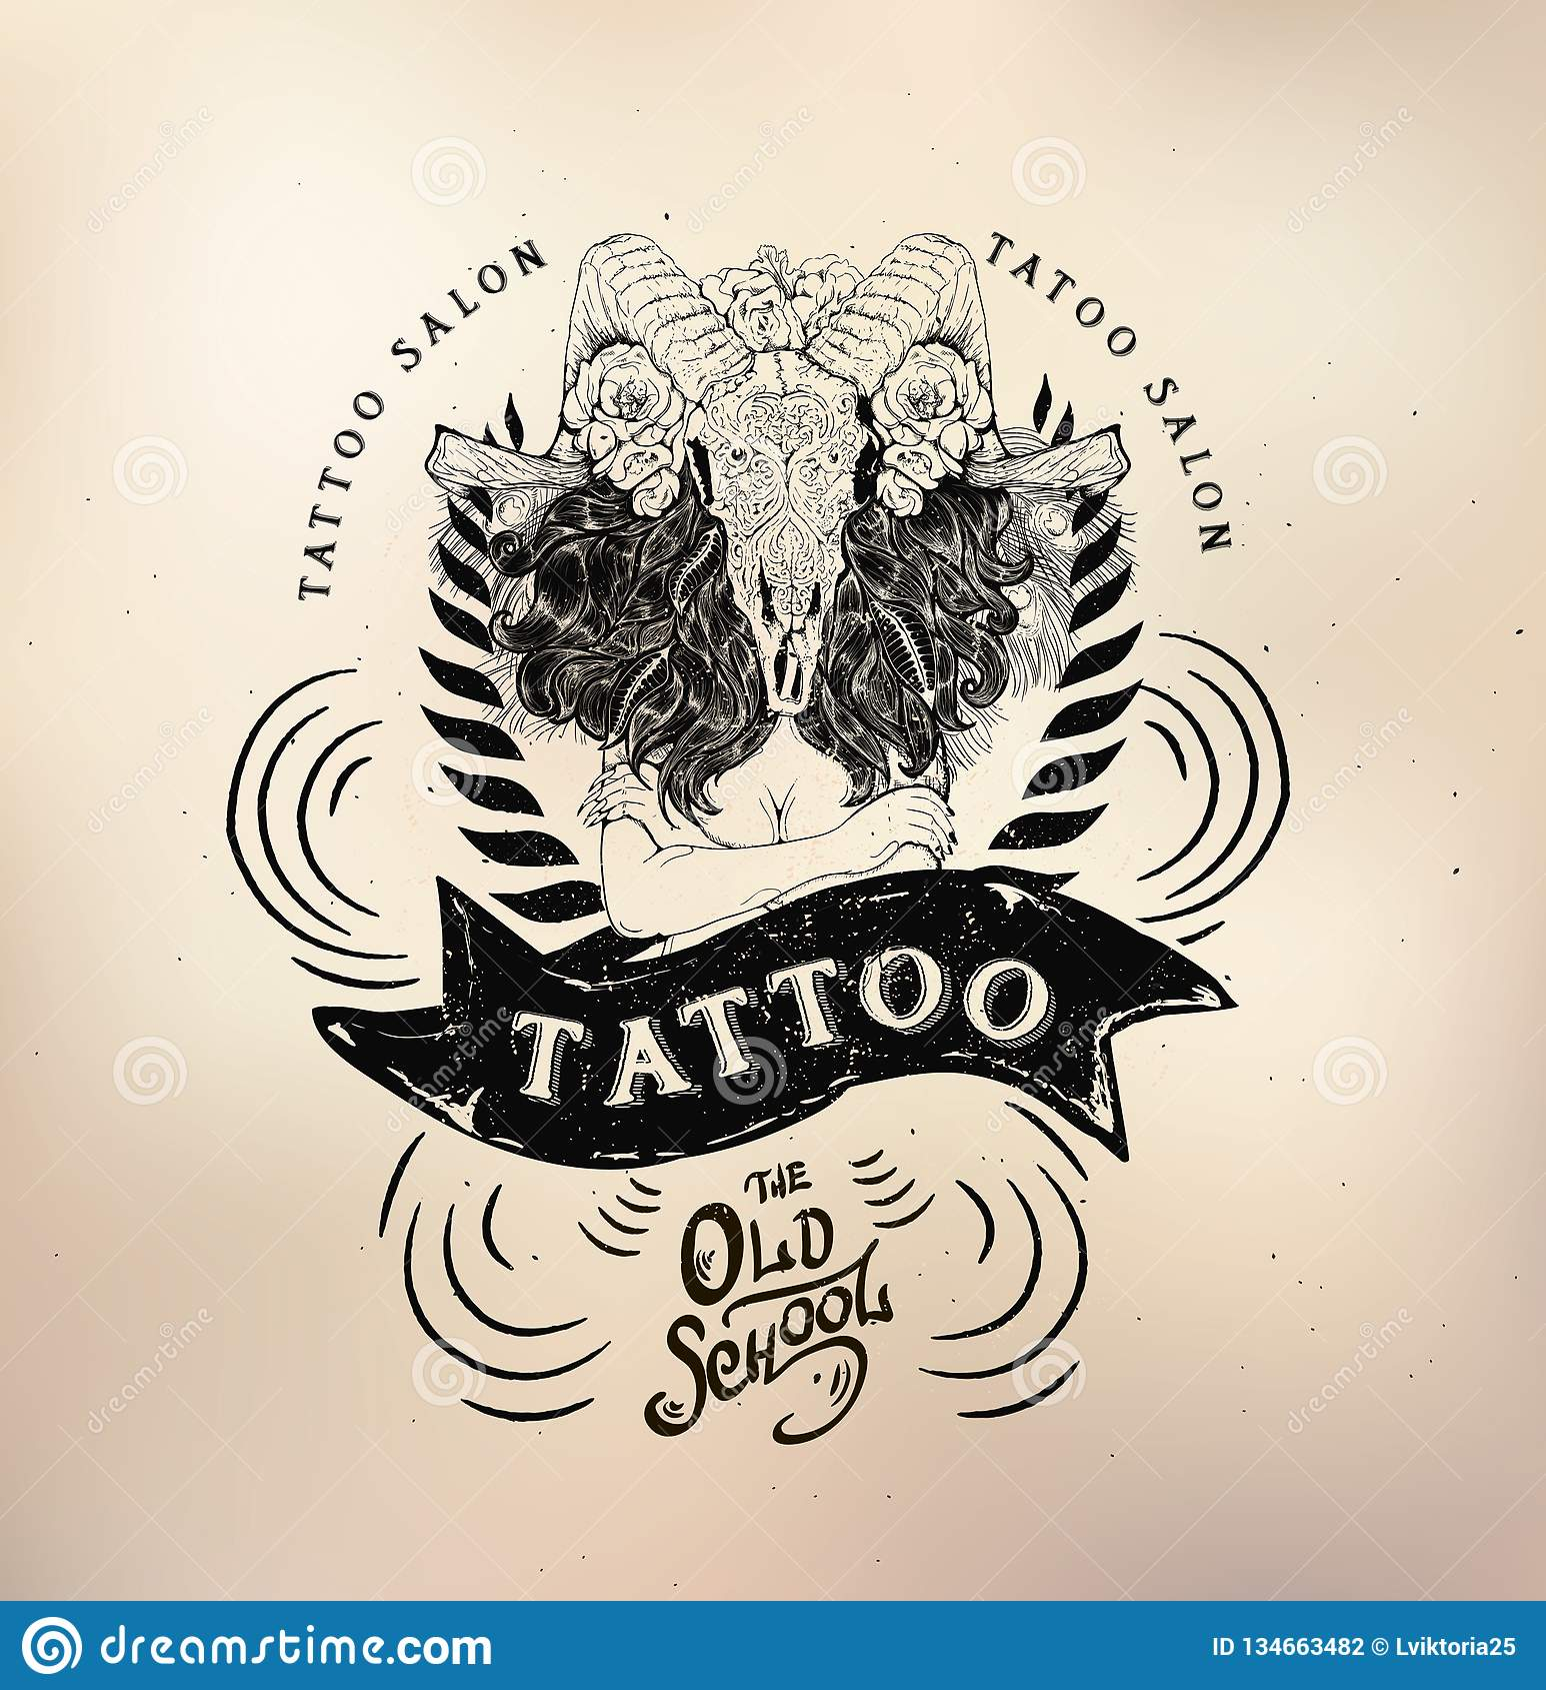 6c6c0ff30 Tattoo Girl Old School Studio Skull Stock Illustration ...